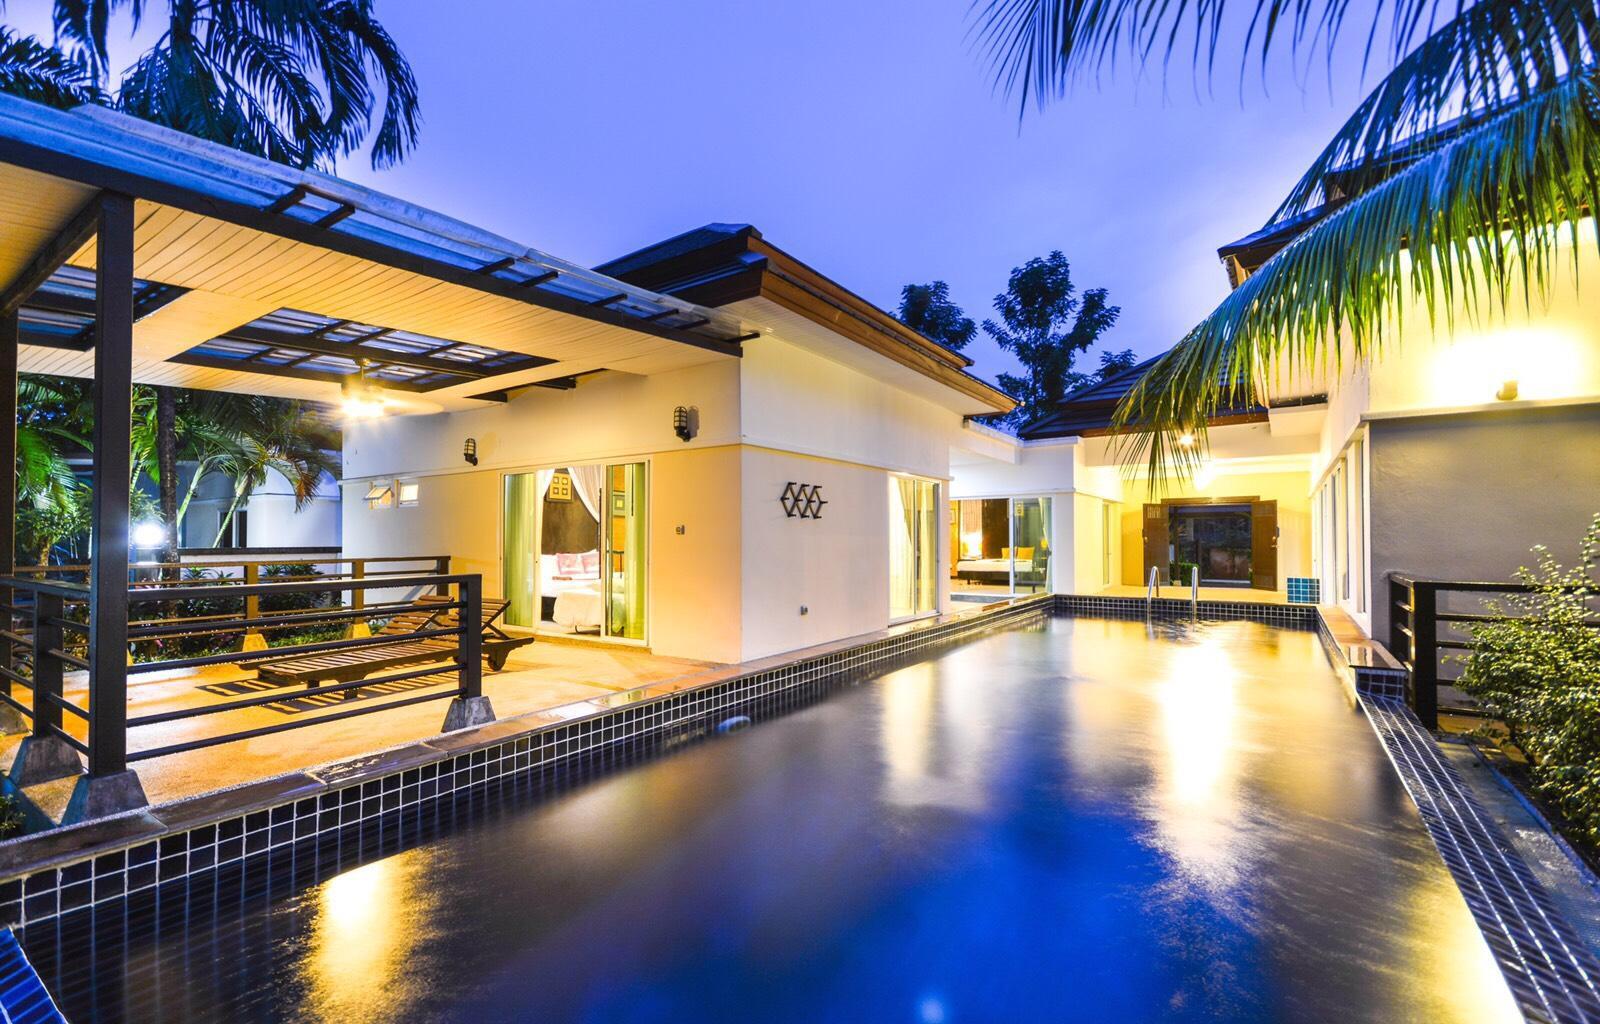 Les Palm Waterfall Pool Villa